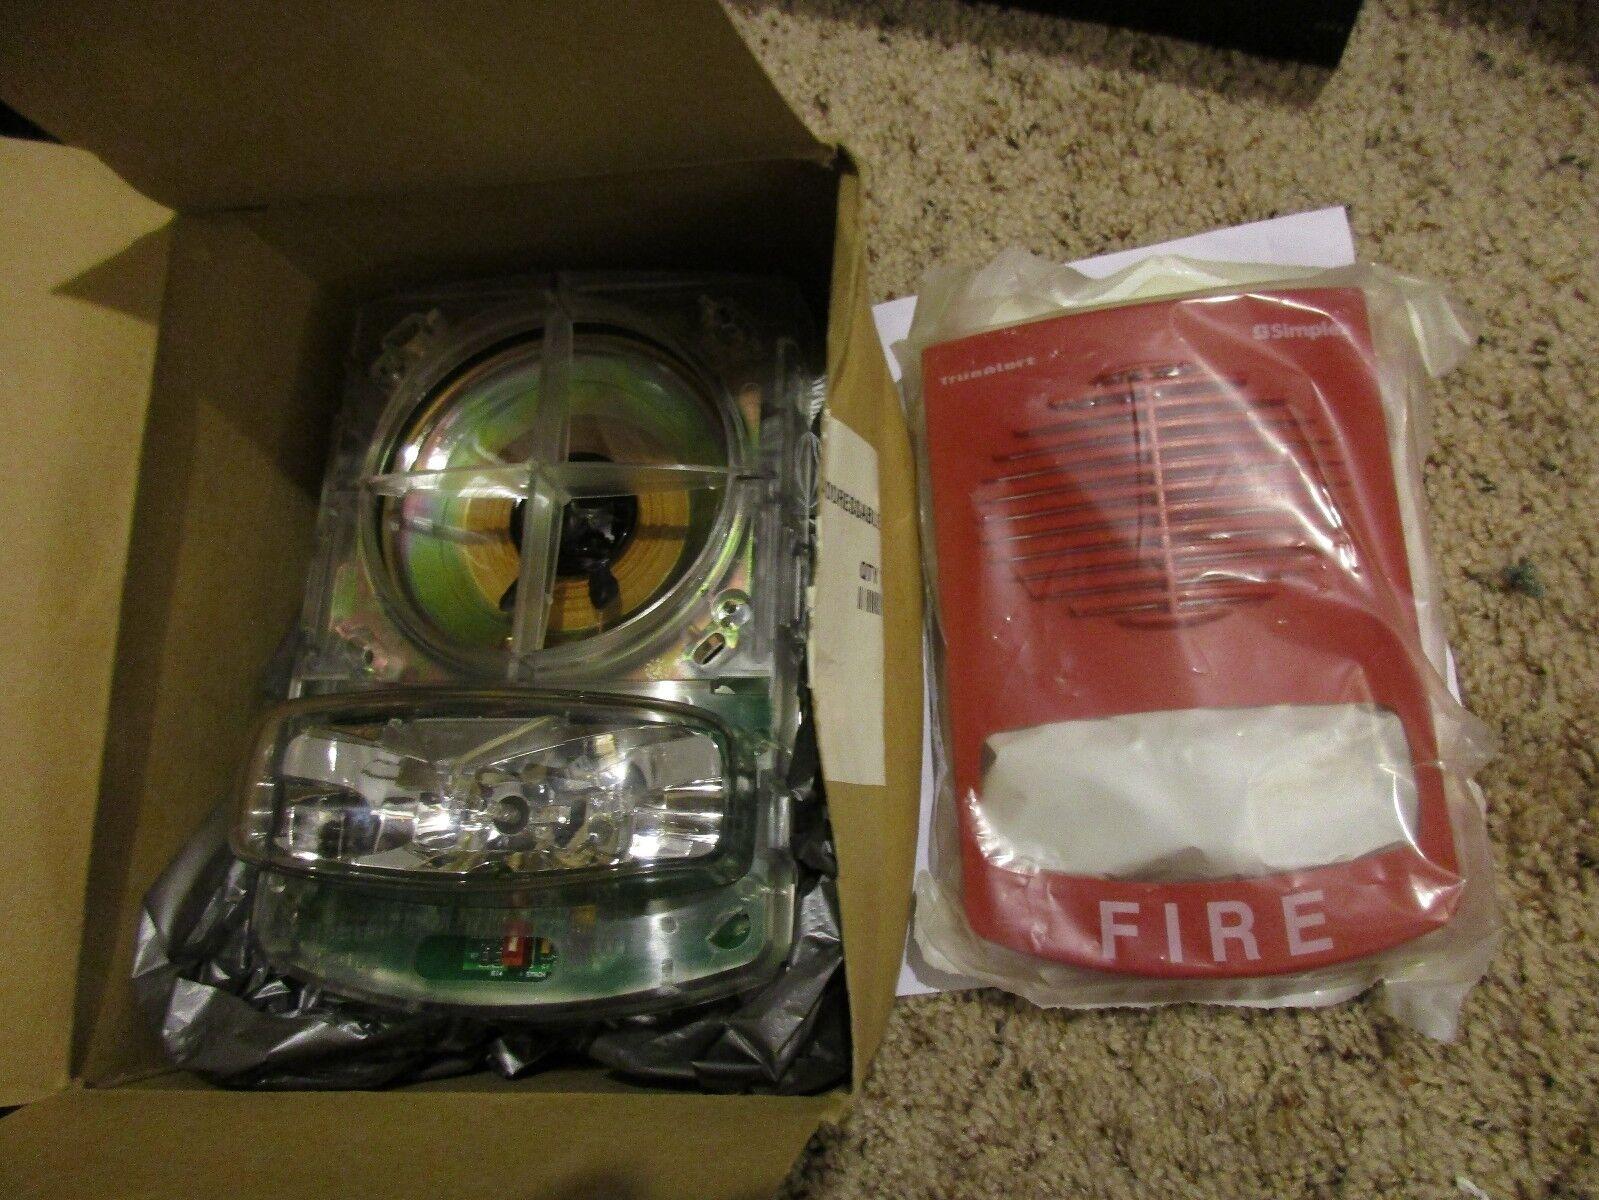 NEW SIMPLEX TRUEALERT 4903-9356 NON-ADDRESSABLE RED 15CD WALL FIRE ALARM 0626805